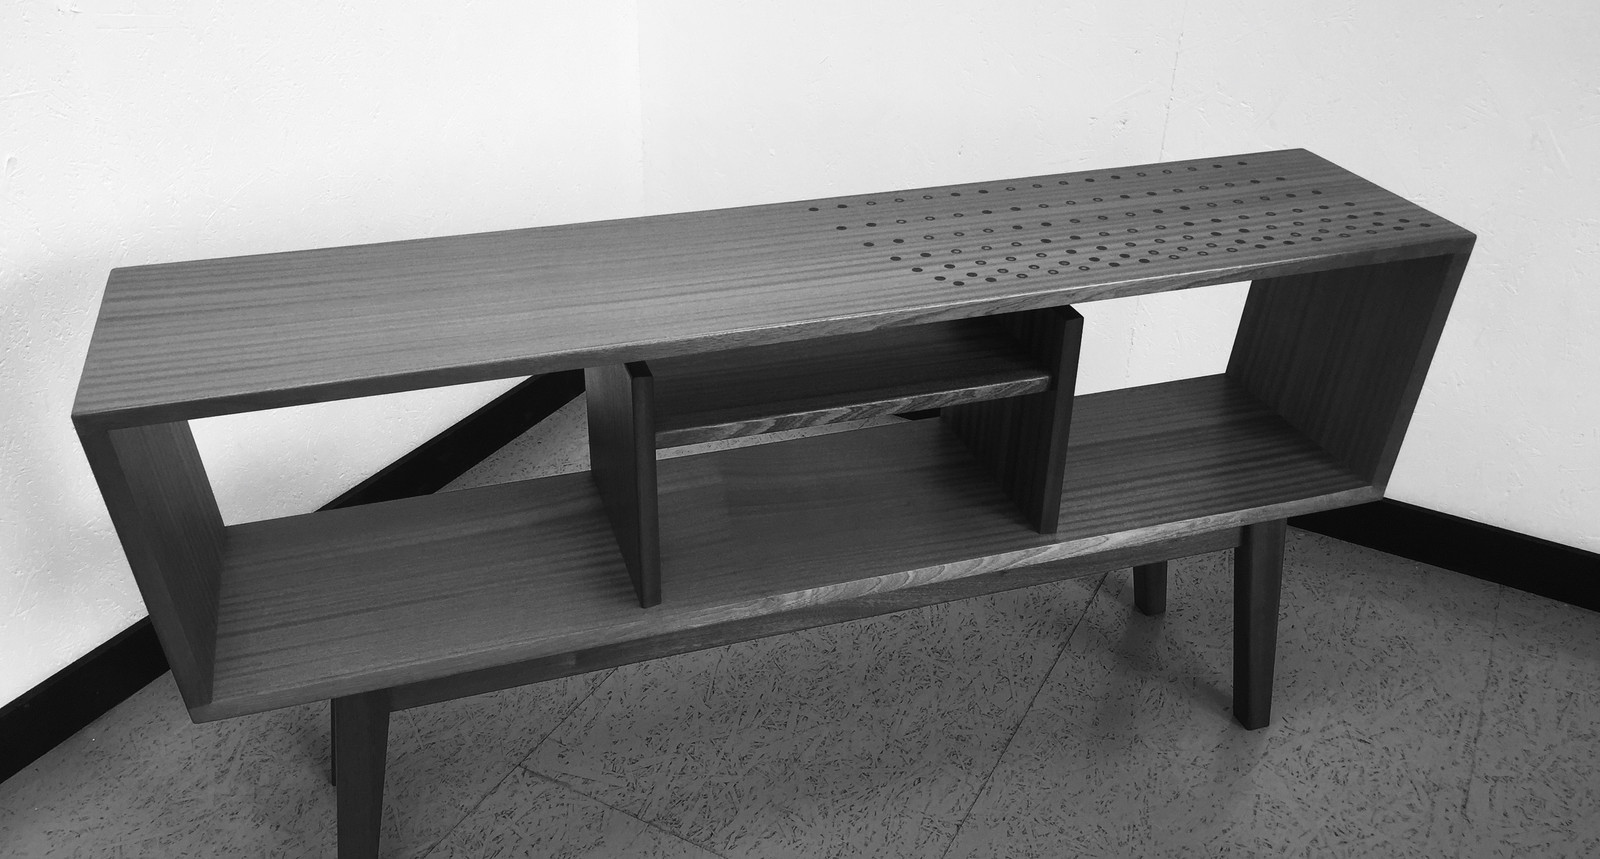 Warren | Last Leaf  Handmade Furniture by Sam Parkin